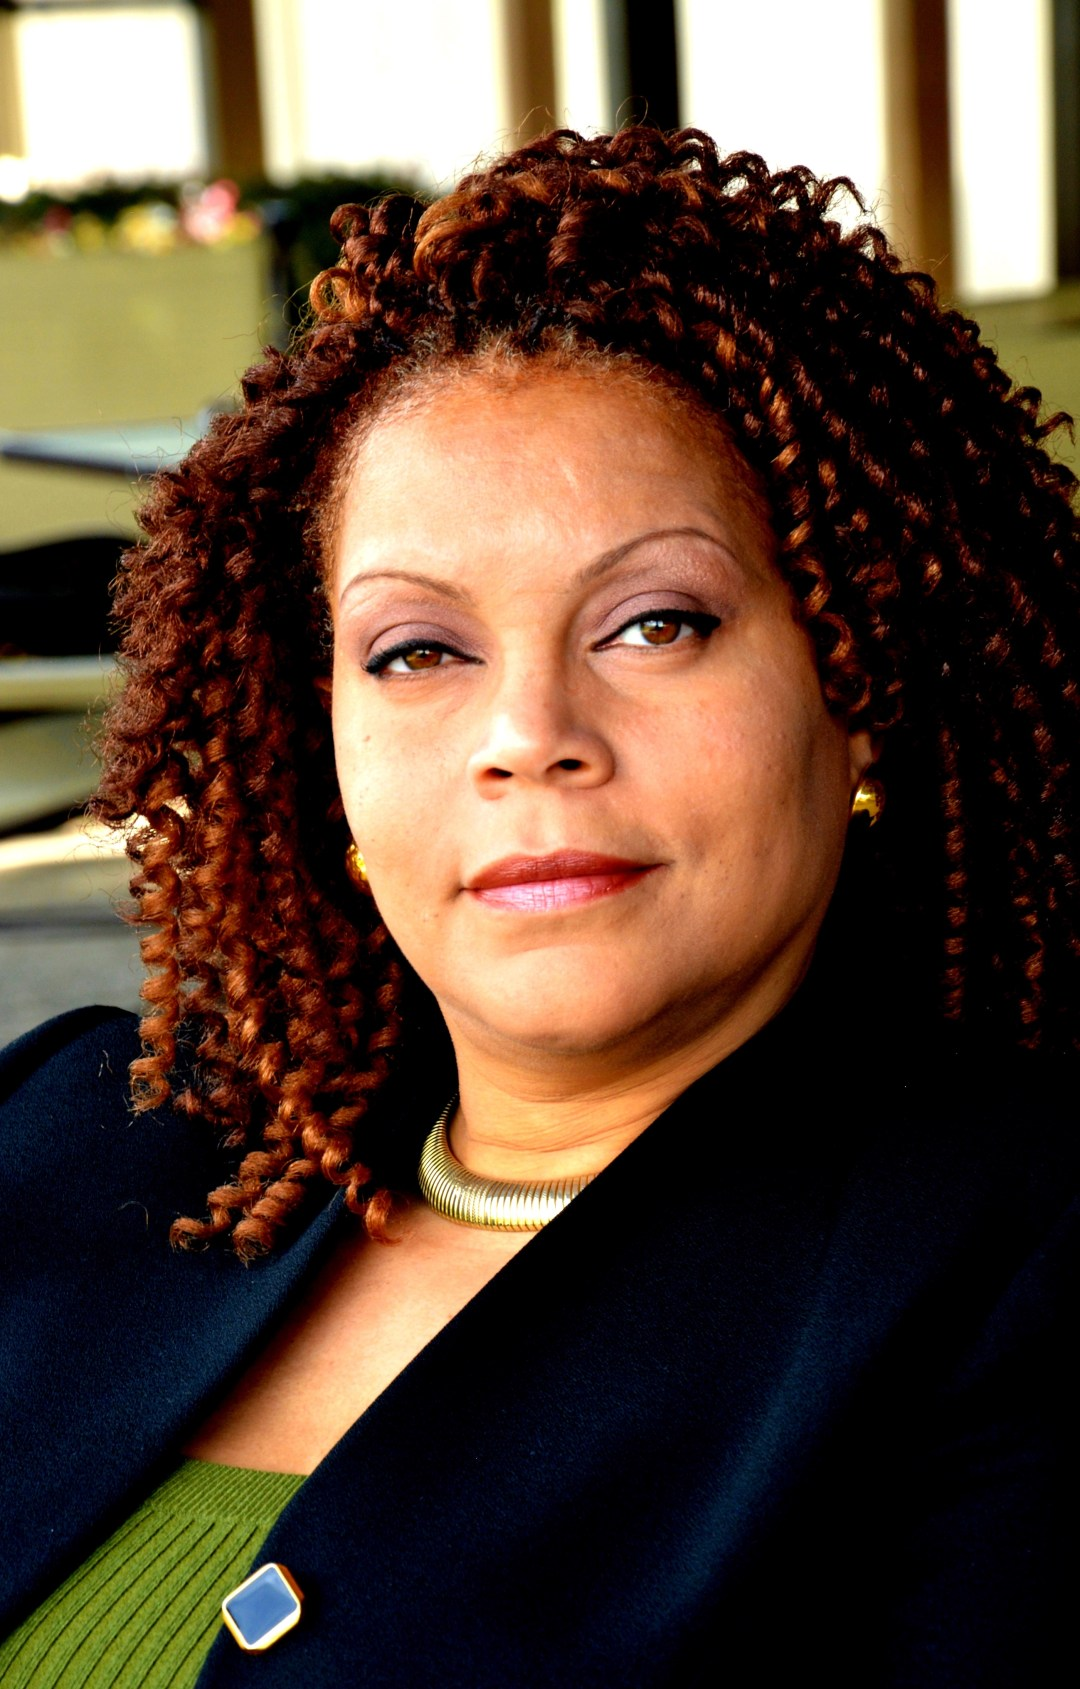 AHI Co-Founder, Cynthia D Prather